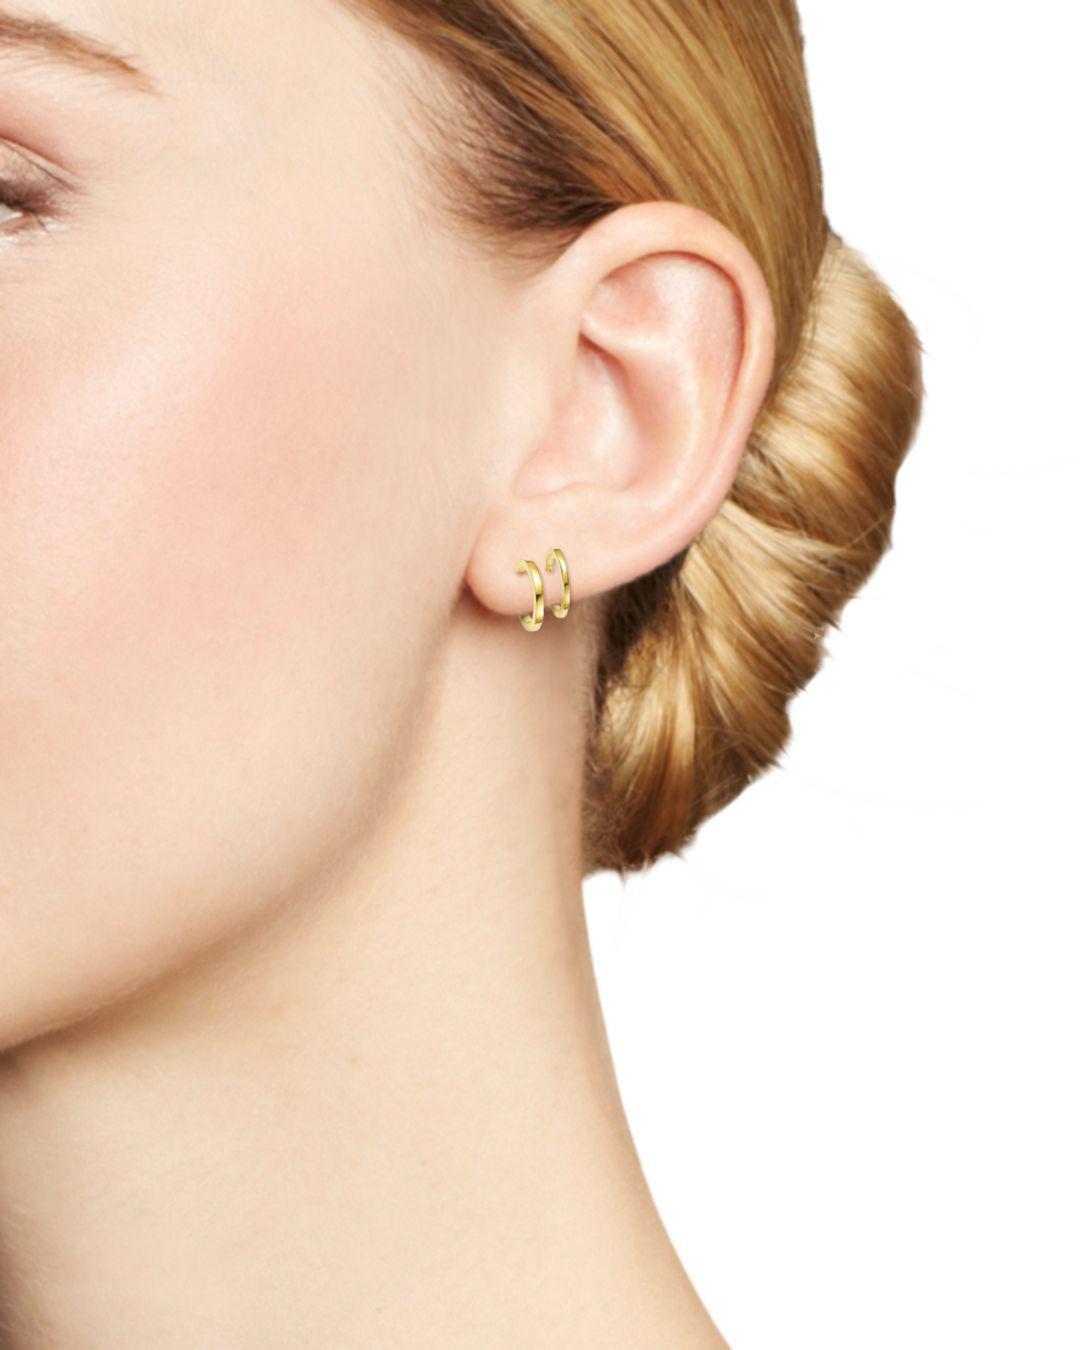 Lyst Zoe Chicco 14k Yellow Gold Double Huggie Hoop Earrings In Metallic